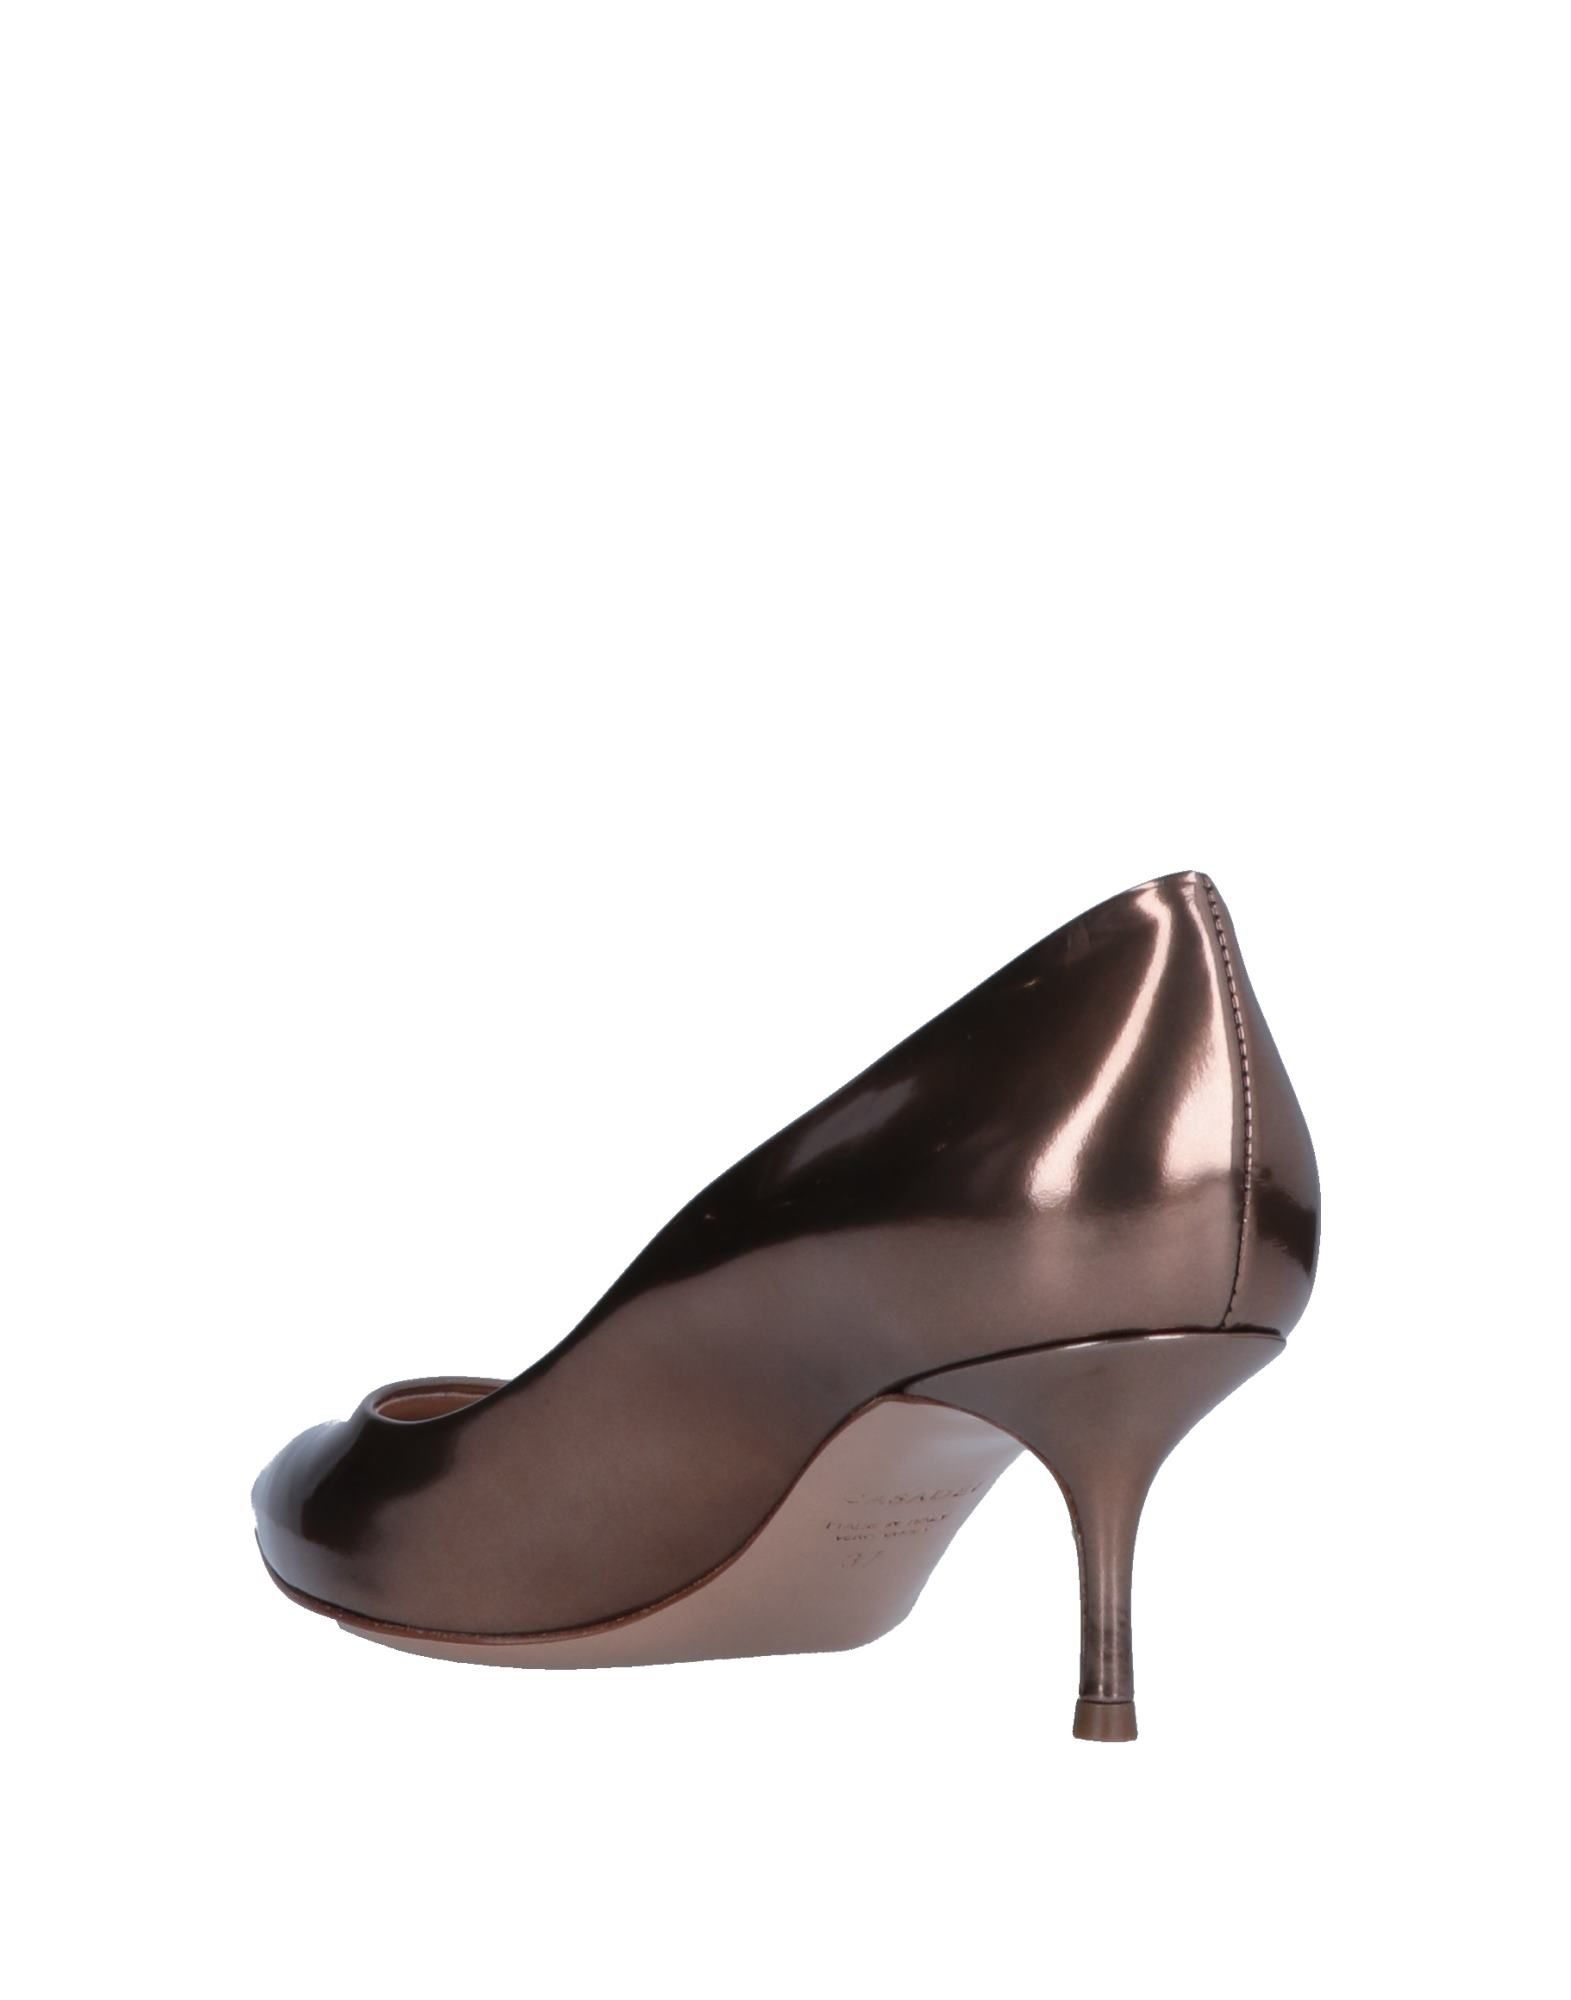 Rabatt Schuhe Casadei Pumps 11544265HB Damen 11544265HB Pumps e88a7f